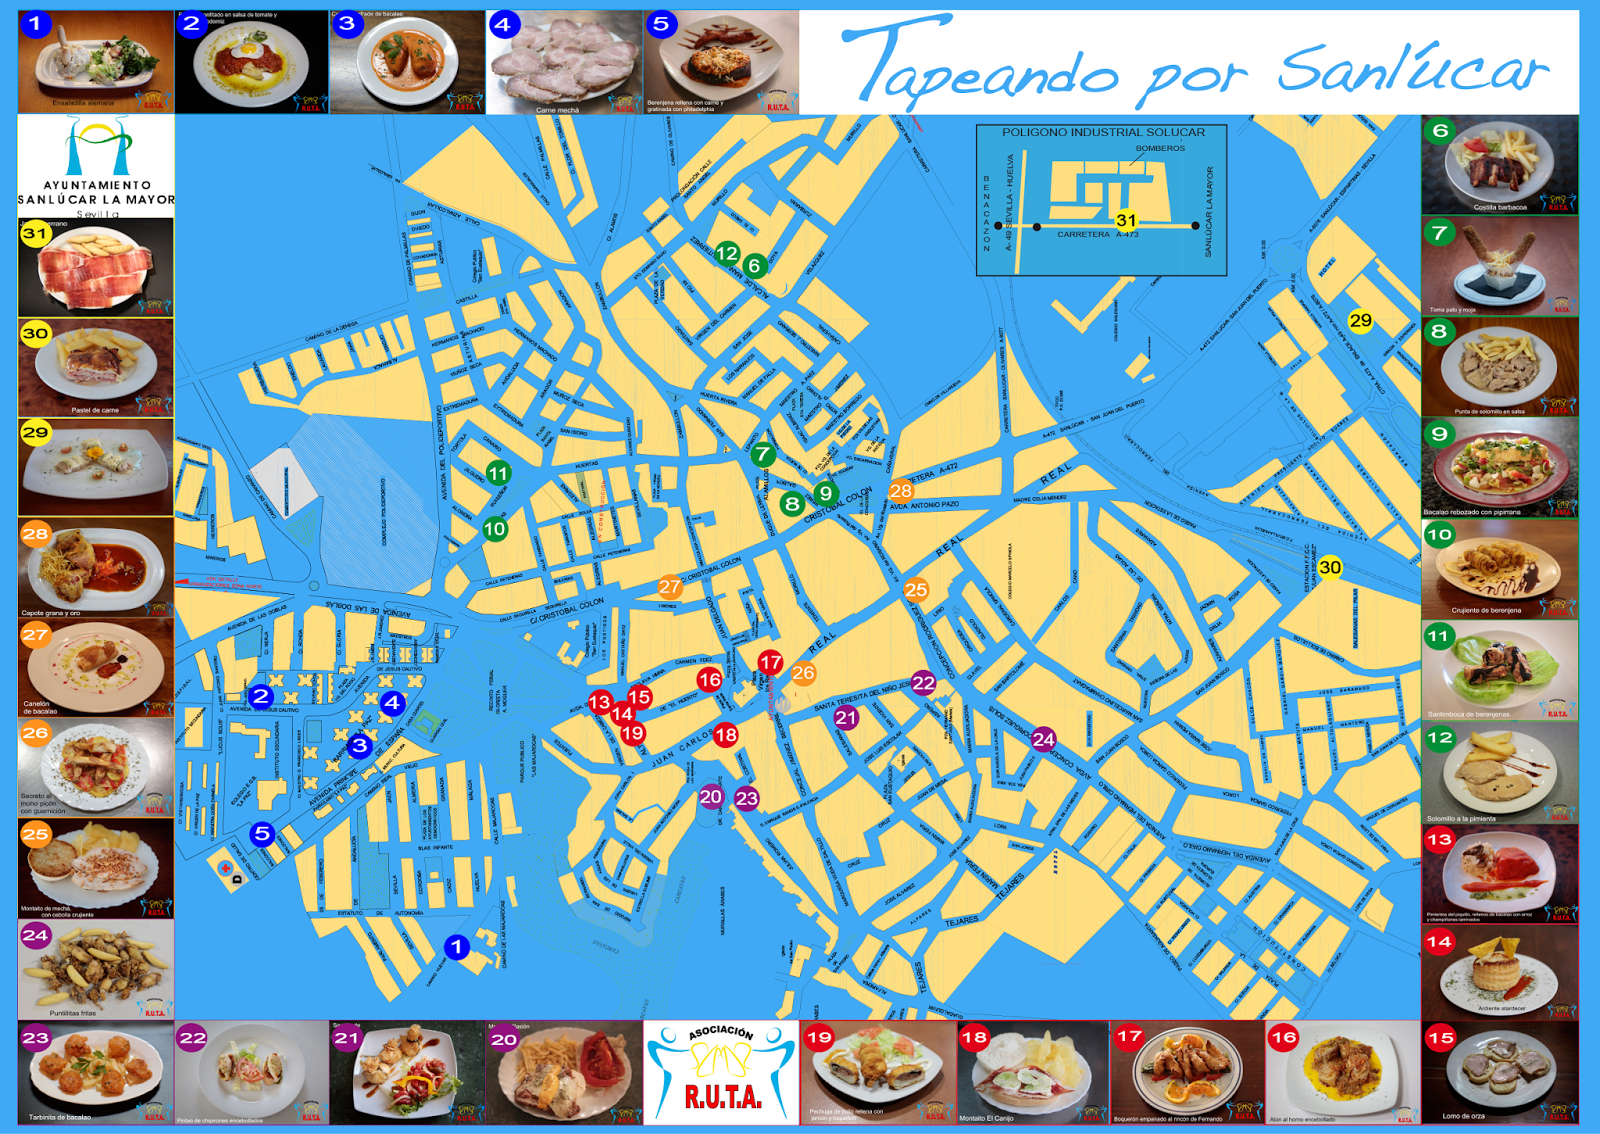 Mapa Tapeando por Sanlúcar 2014